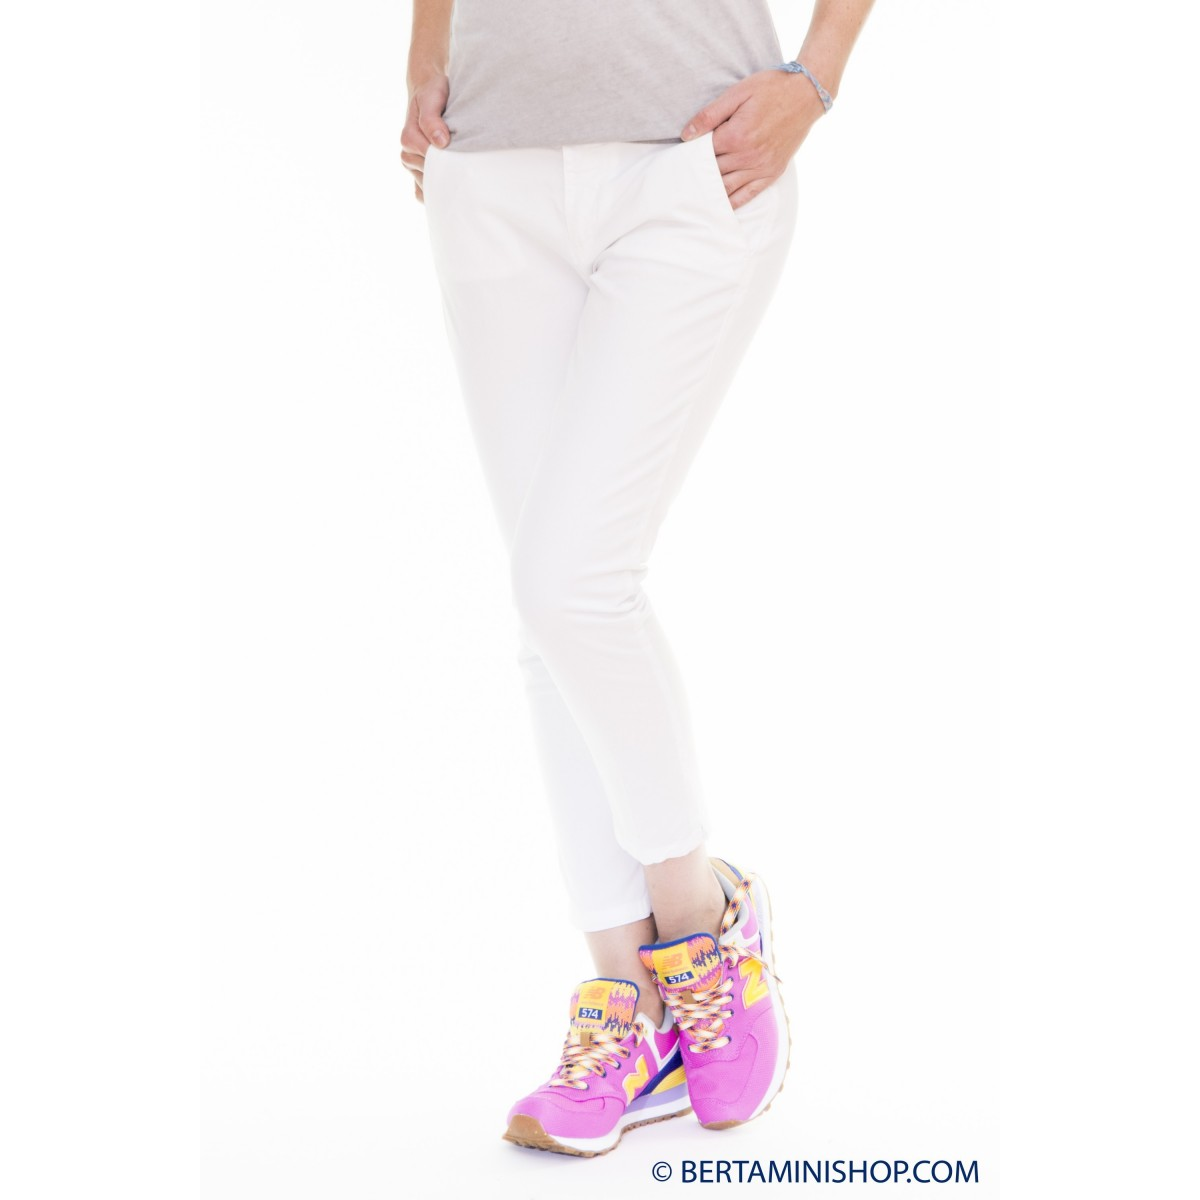 Pantalone donna 40 weft - Melitas 6062 pantalone strech 441 - bianco